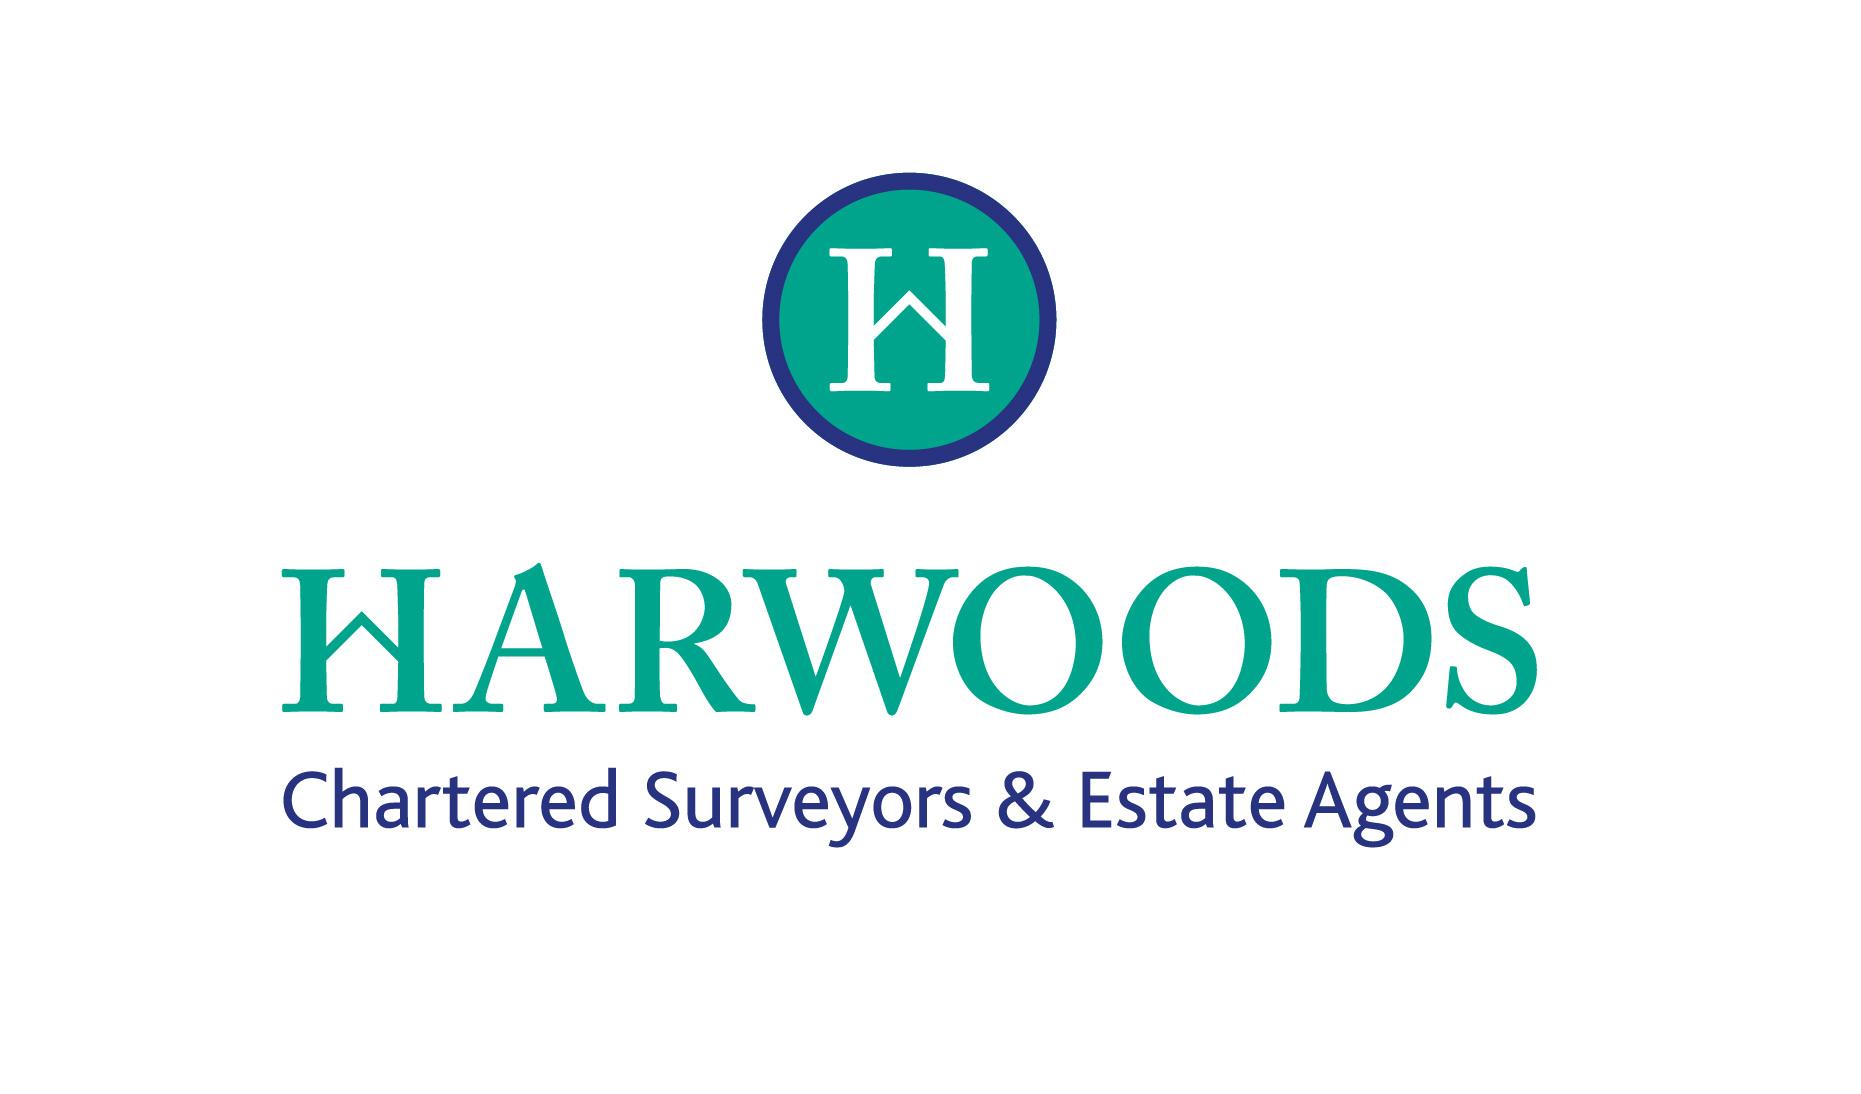 Harwoods_1_RGB-01